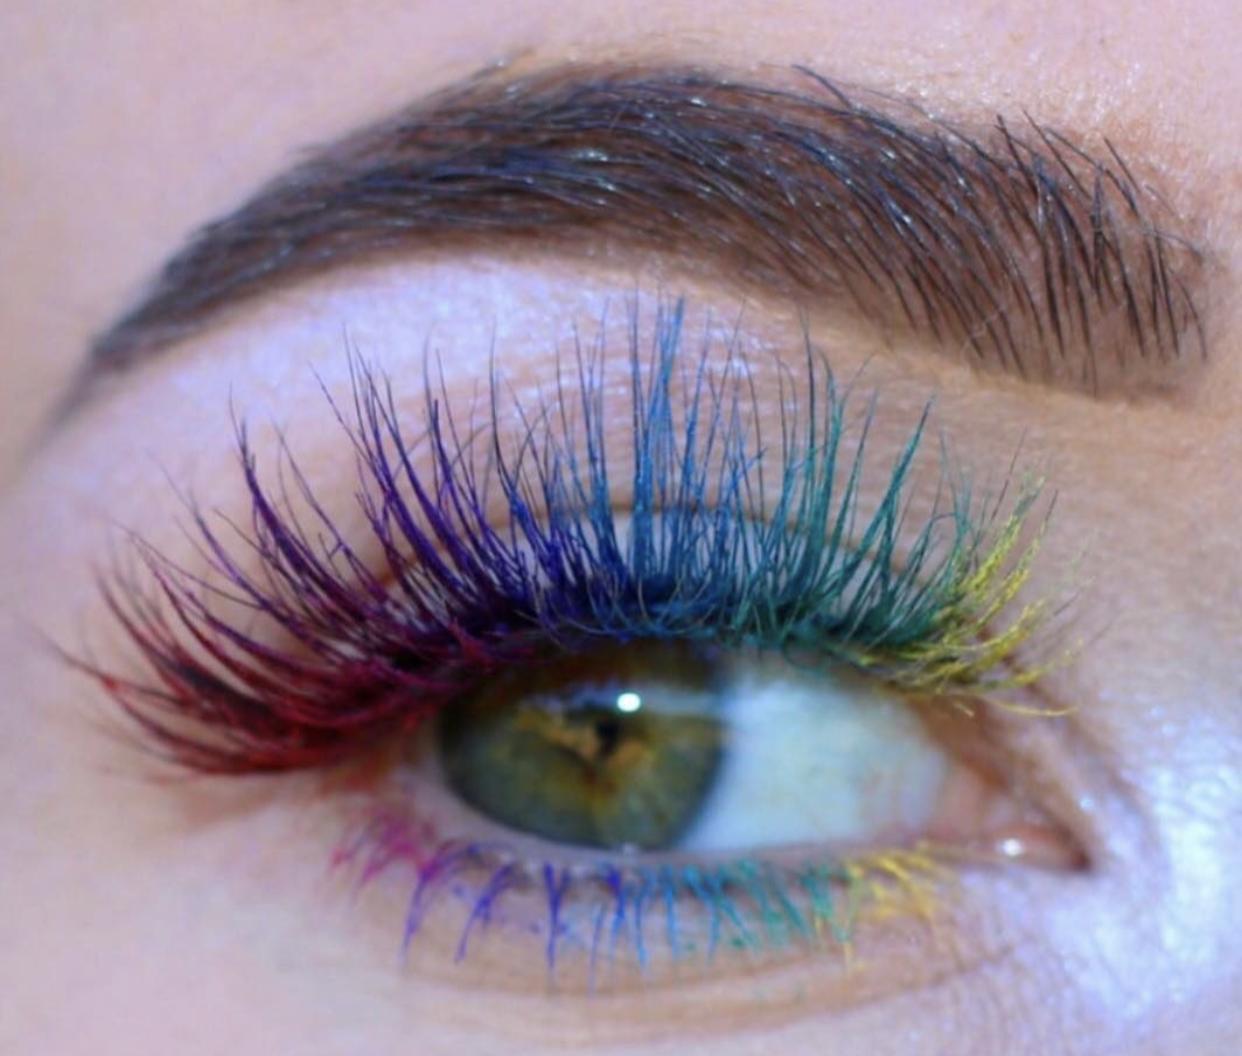 Pin by asma Jroudi on lashextension | Eyelash extensions ...